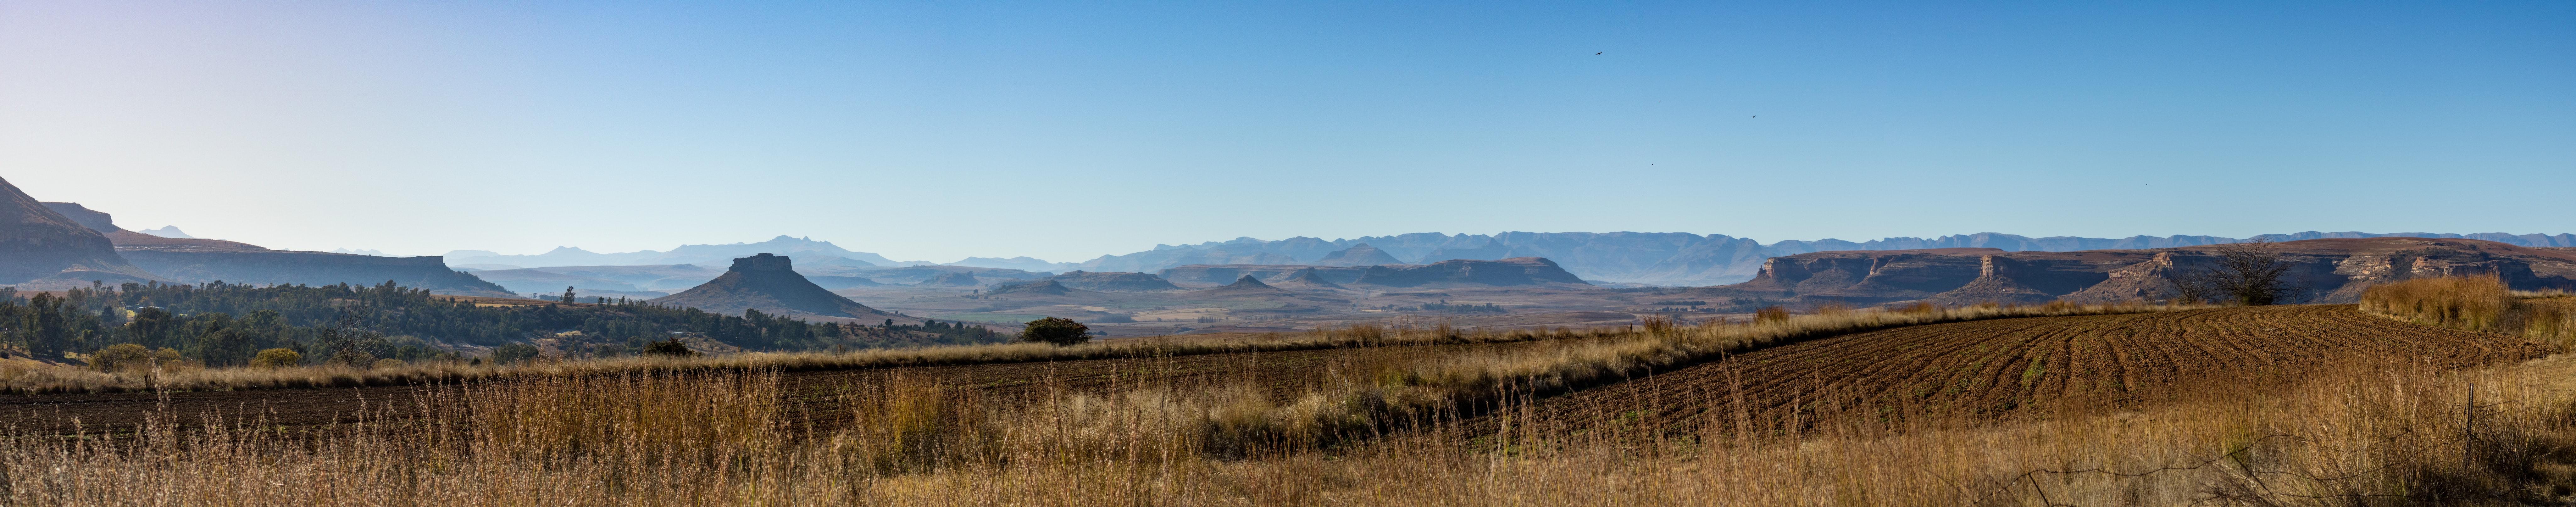 Foto Gratuita Di Paesaggio Savana Sfondo 4k